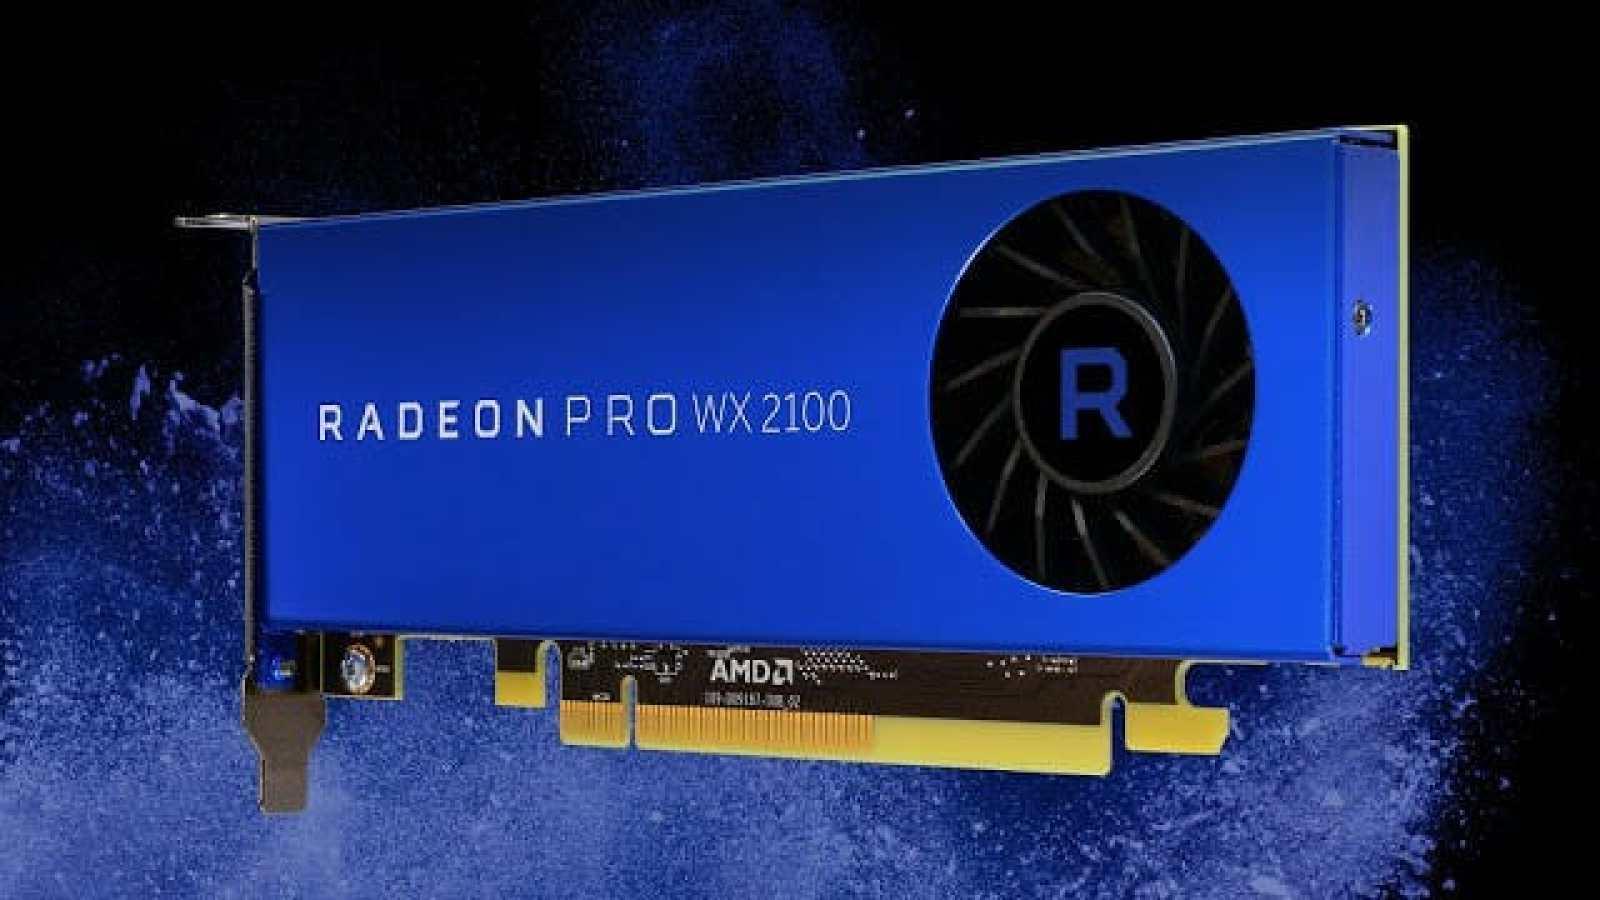 - amd radeon pro wx 200 workstation graphics card 2 - AMD เปิดตัว Radeon Pro WX 8200 มอบประสิทธิภาพกราฟิกระดับเวิร์กสเตชั่น